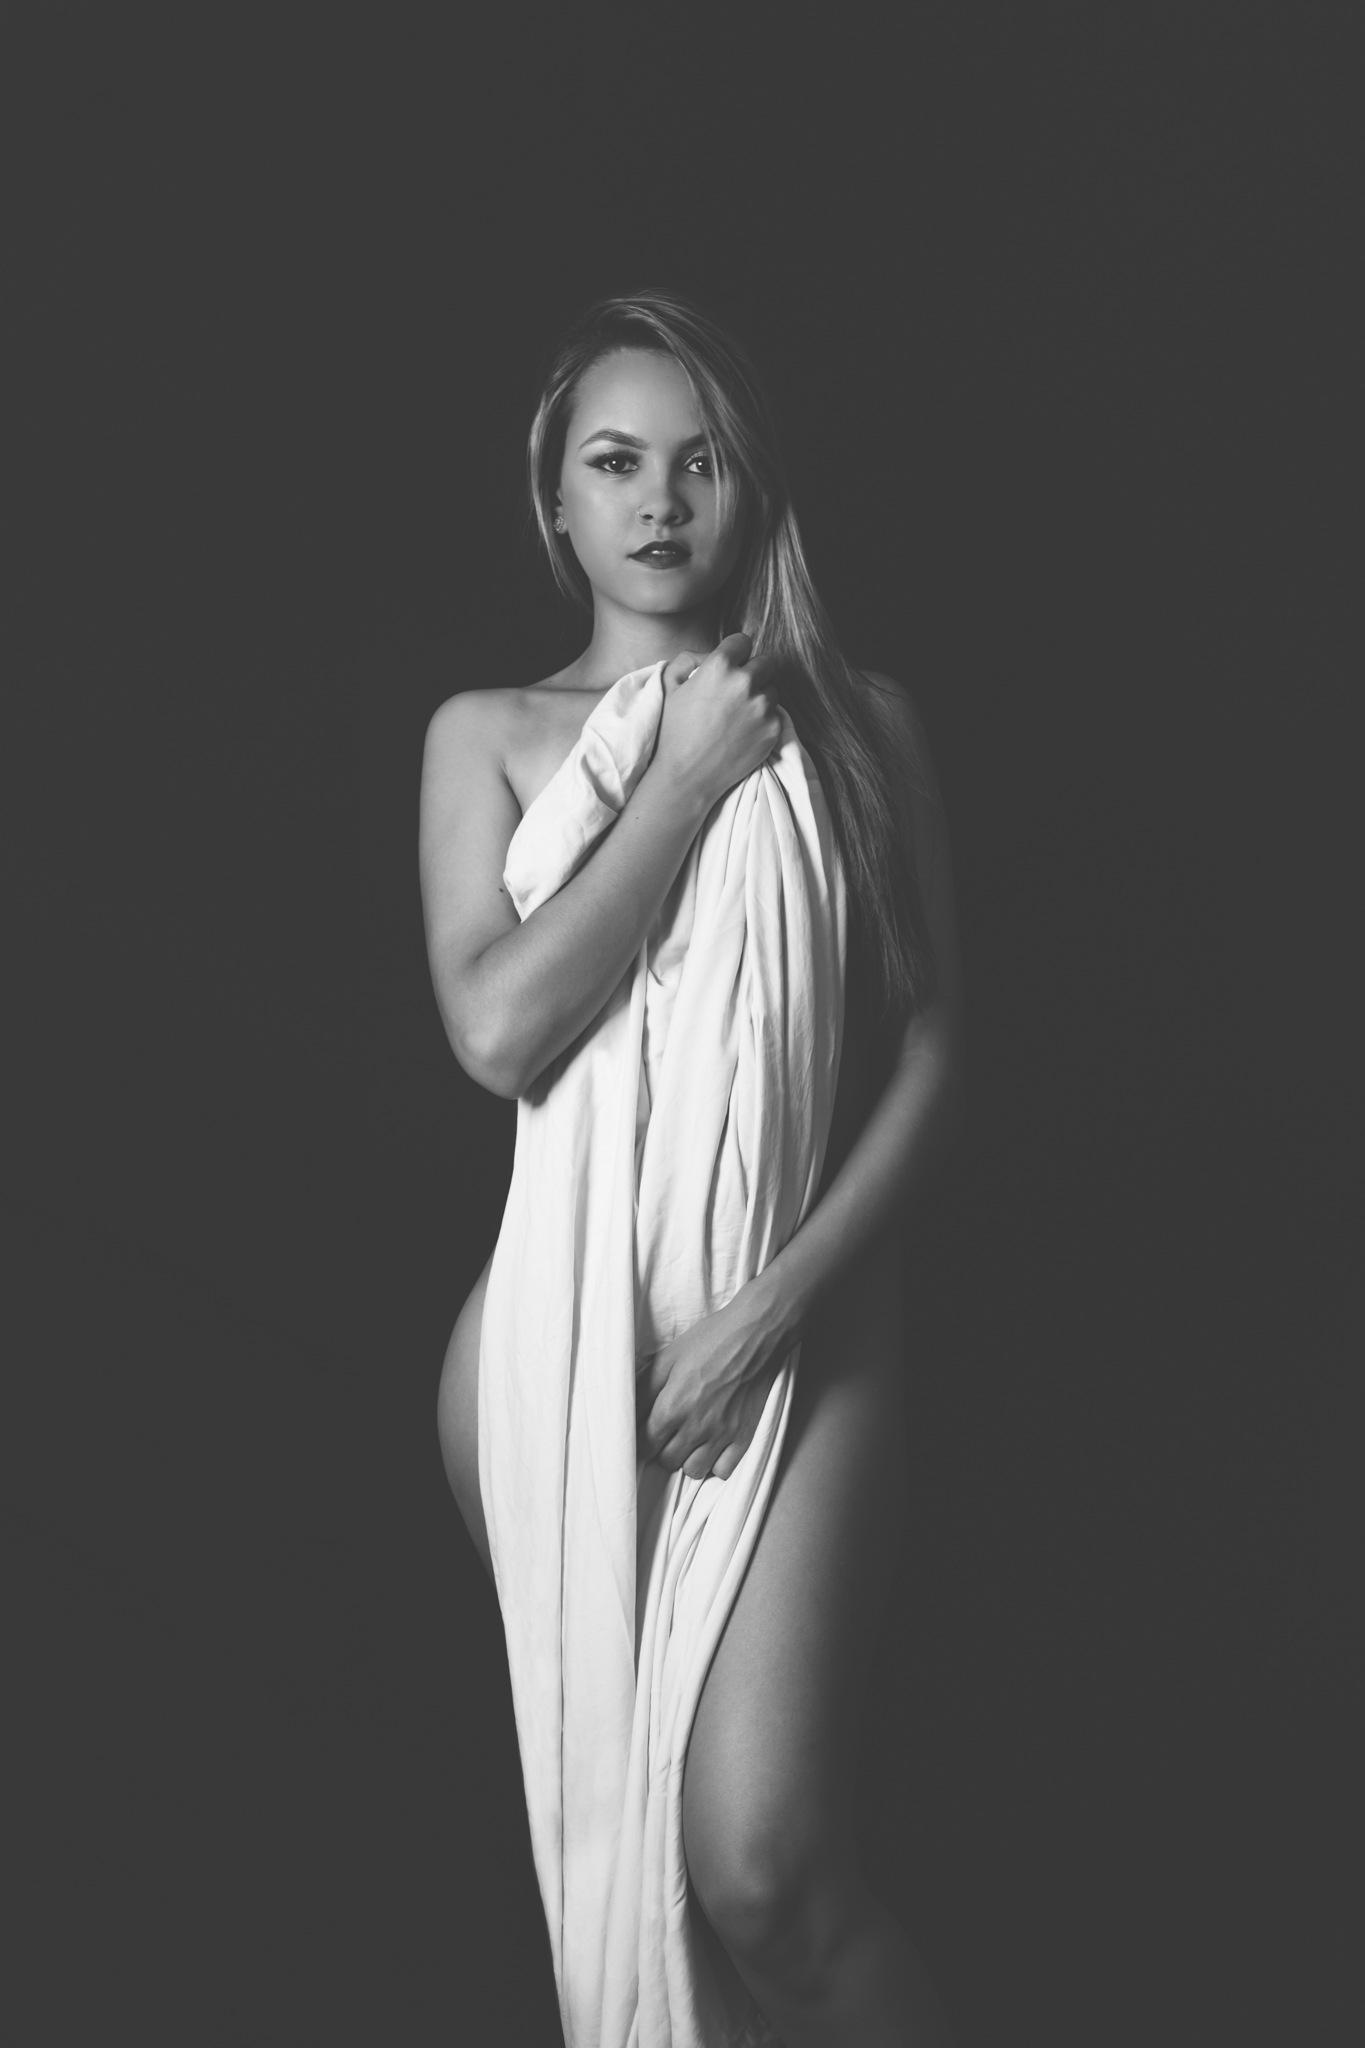 Goddess by priscilamaboni